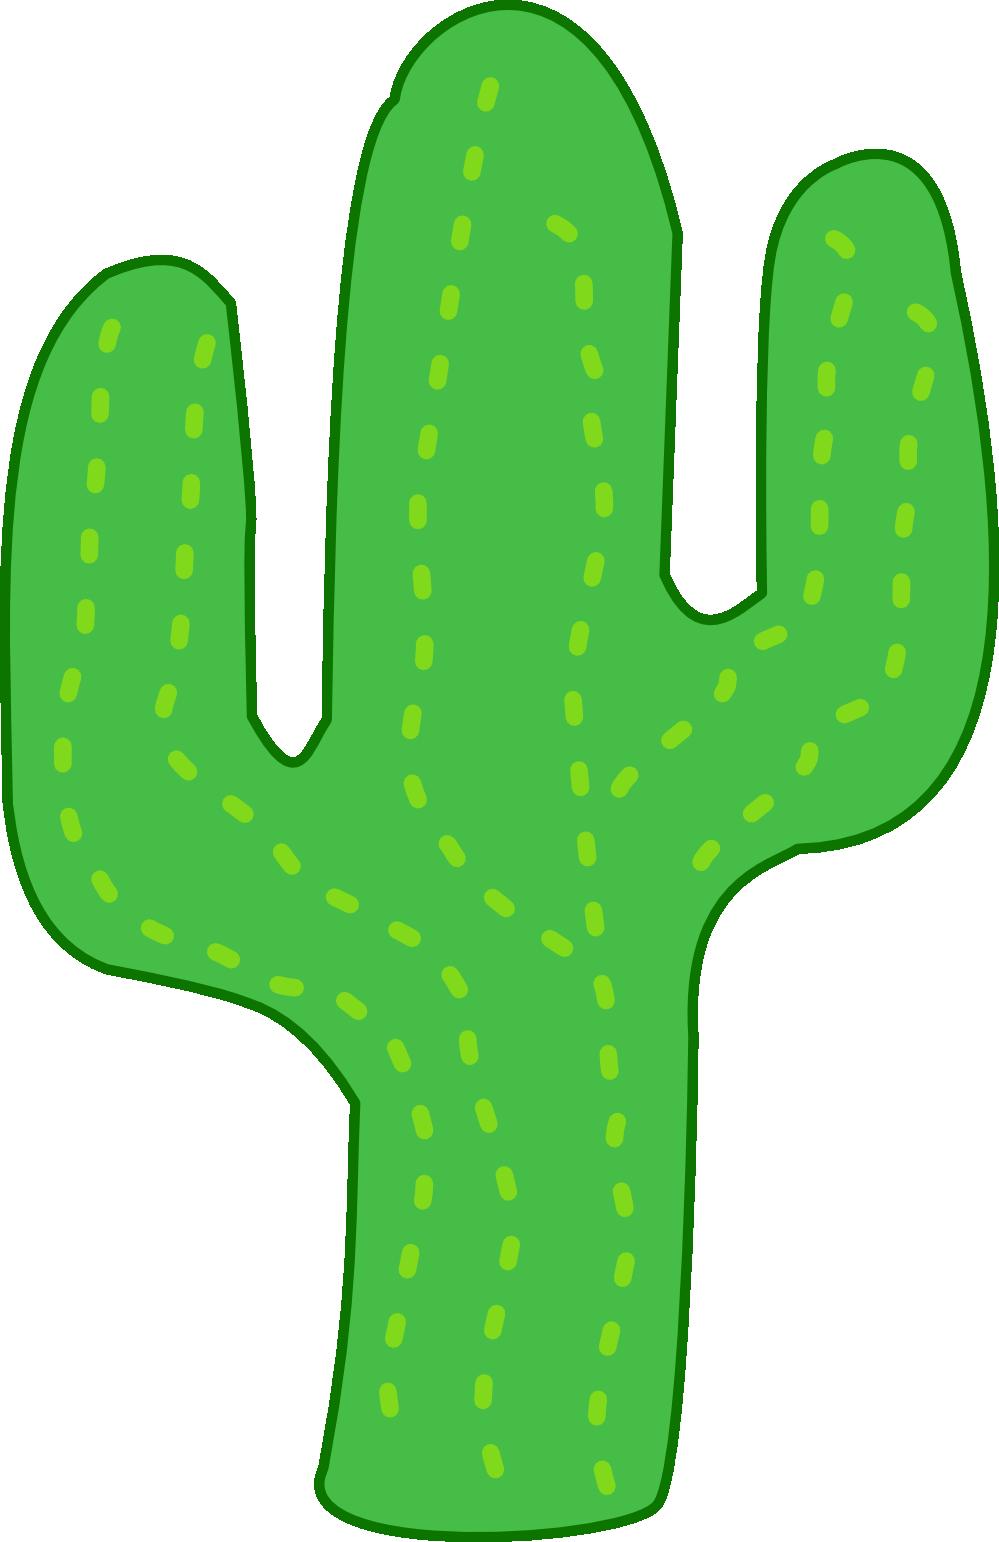 999x1542 Cactus Clipart Free Images